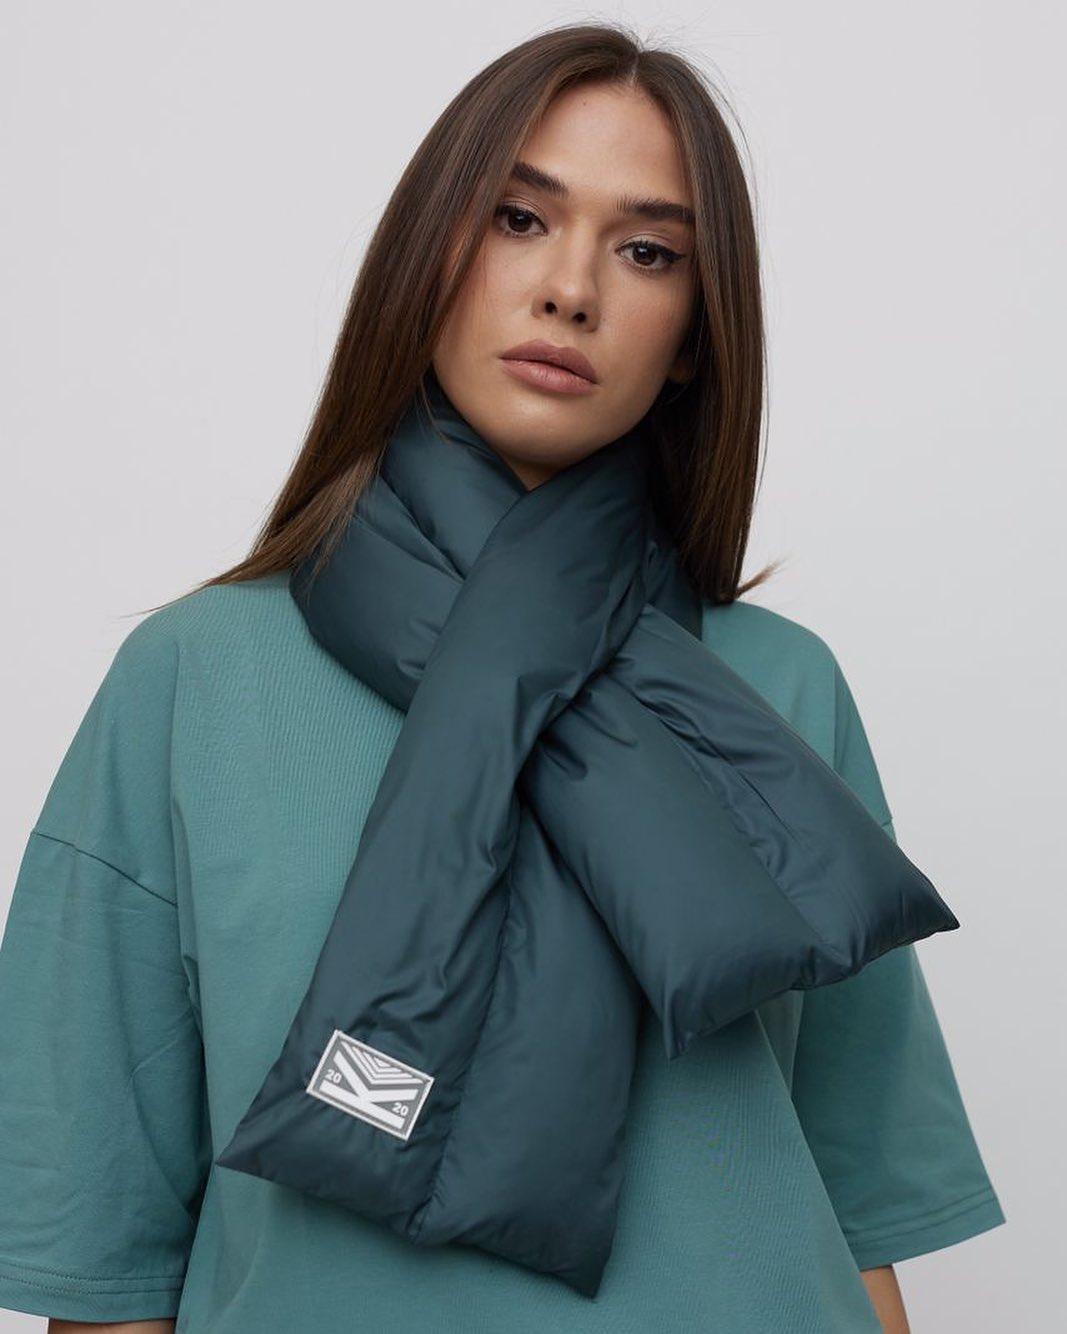 Модный шарф / instagram.com/keep_style